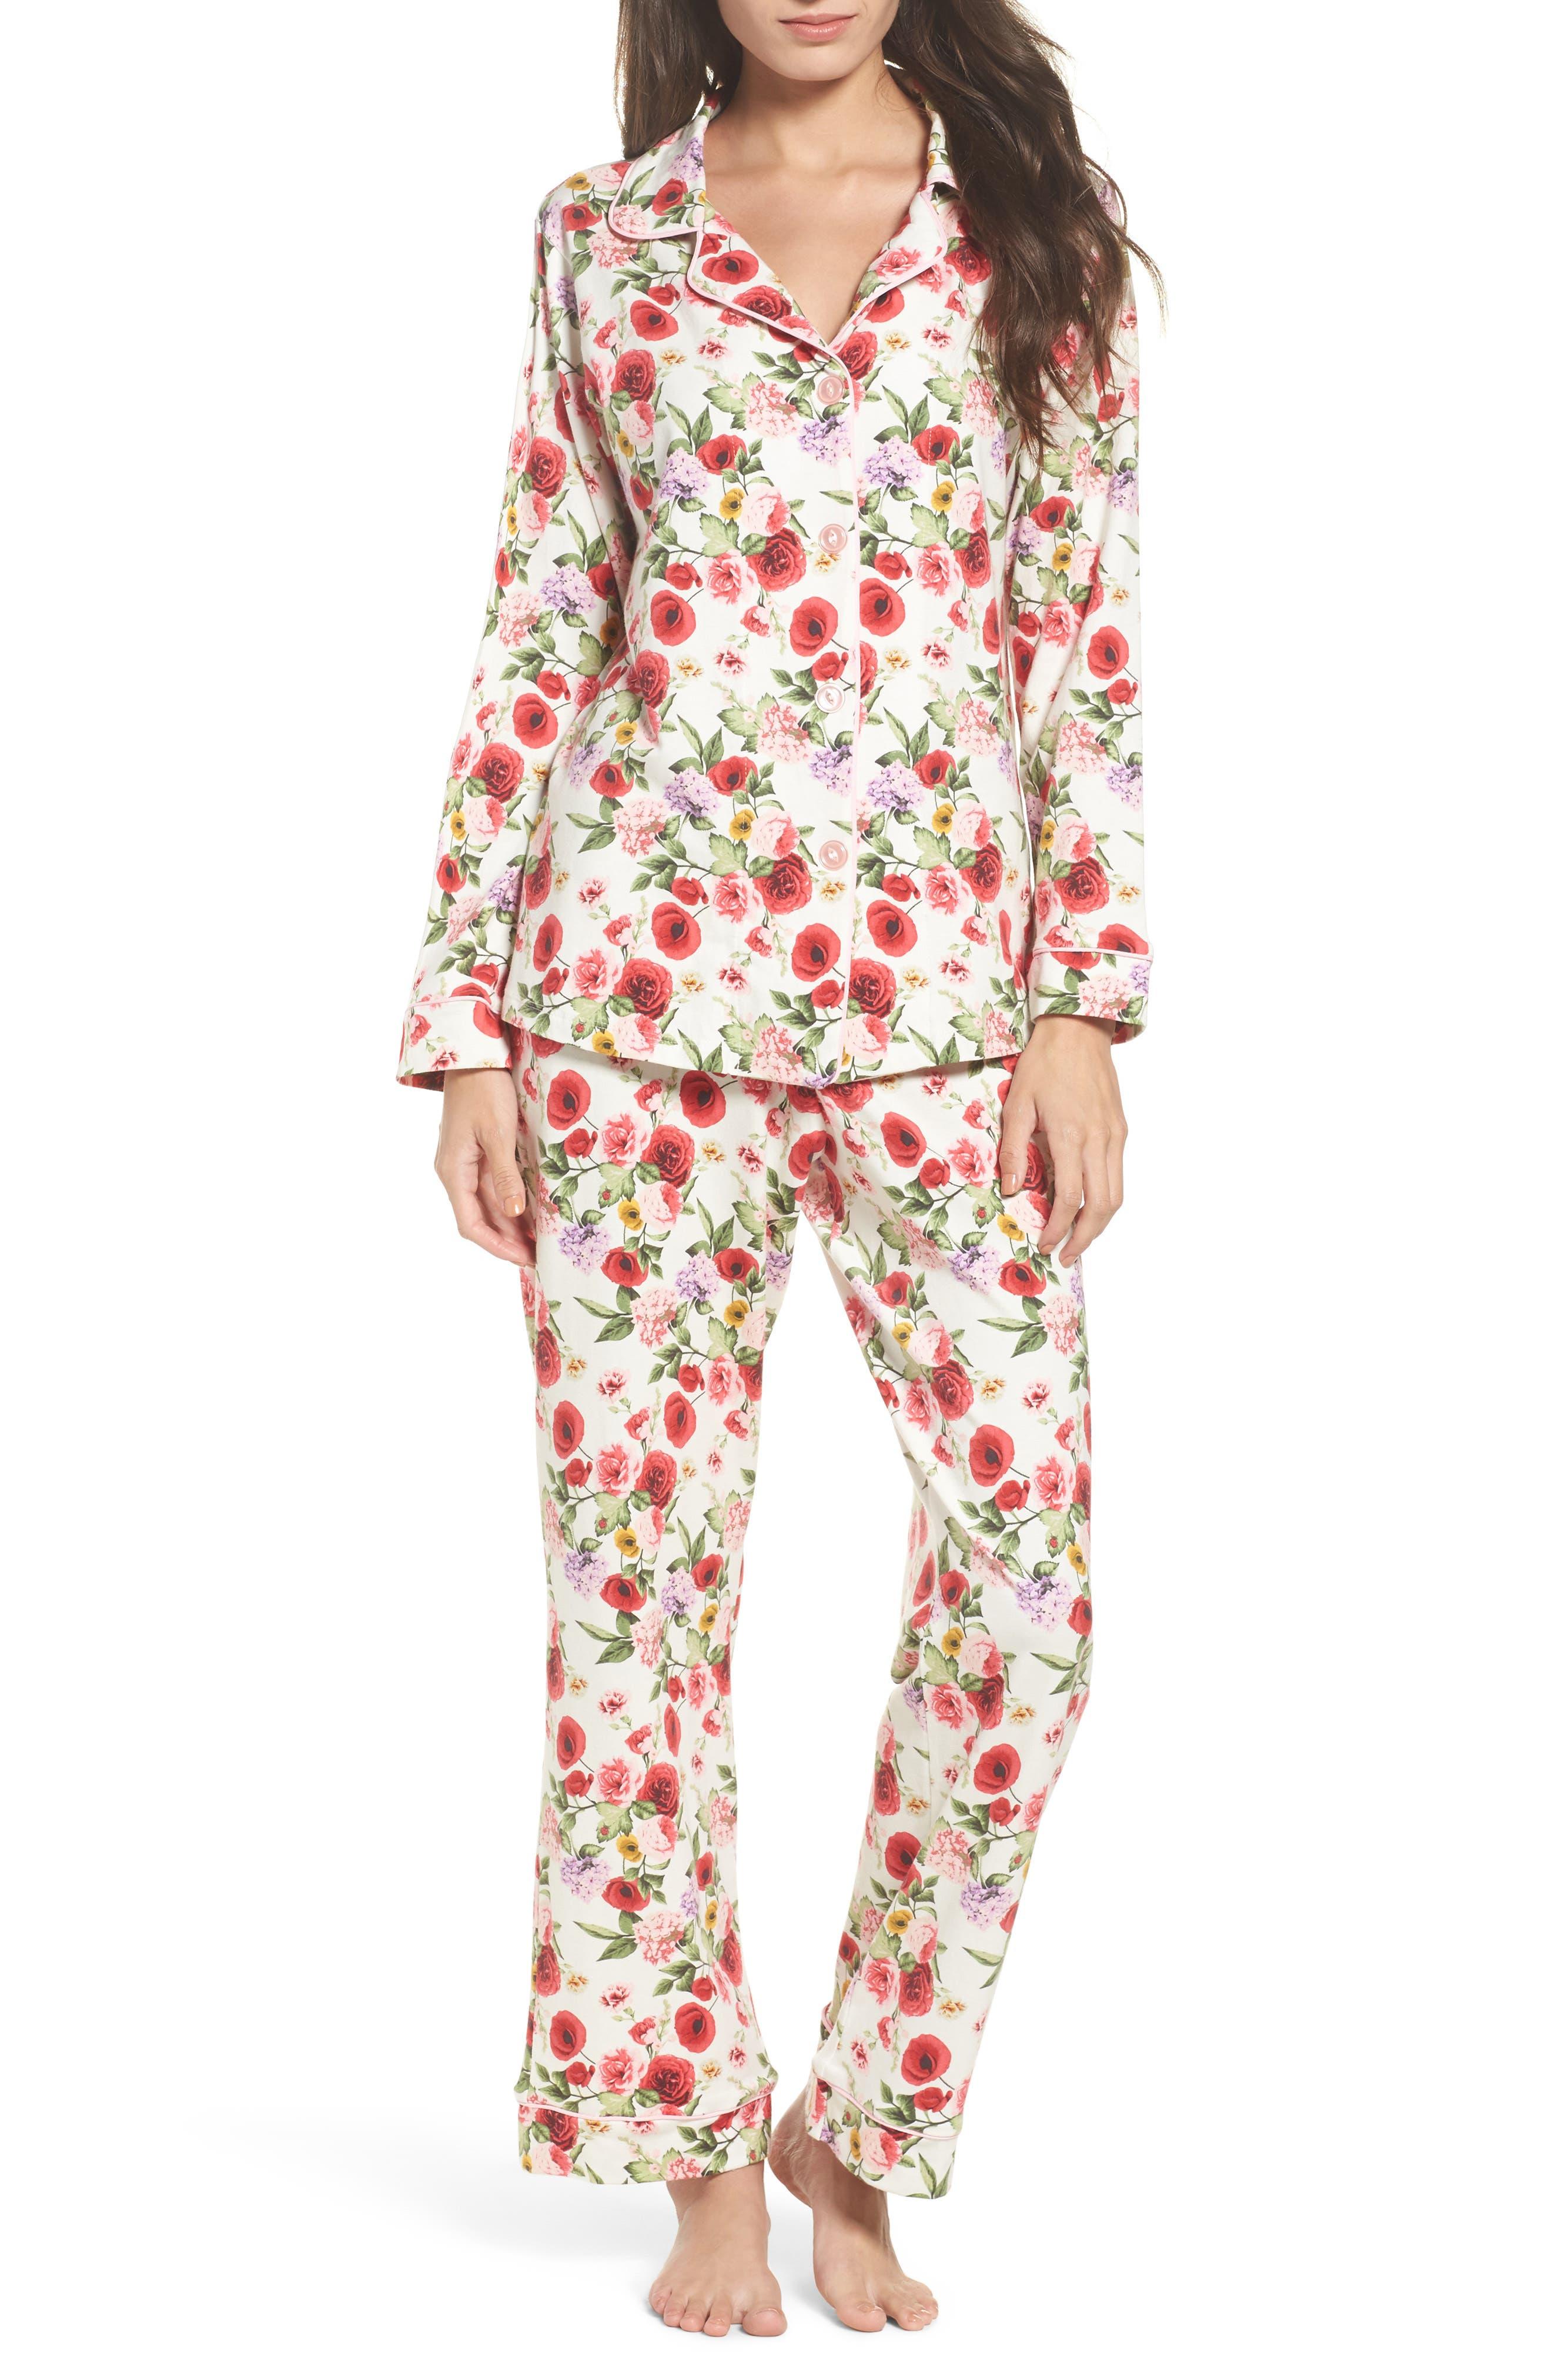 Flower Print Pajamas,                             Main thumbnail 1, color,                             650